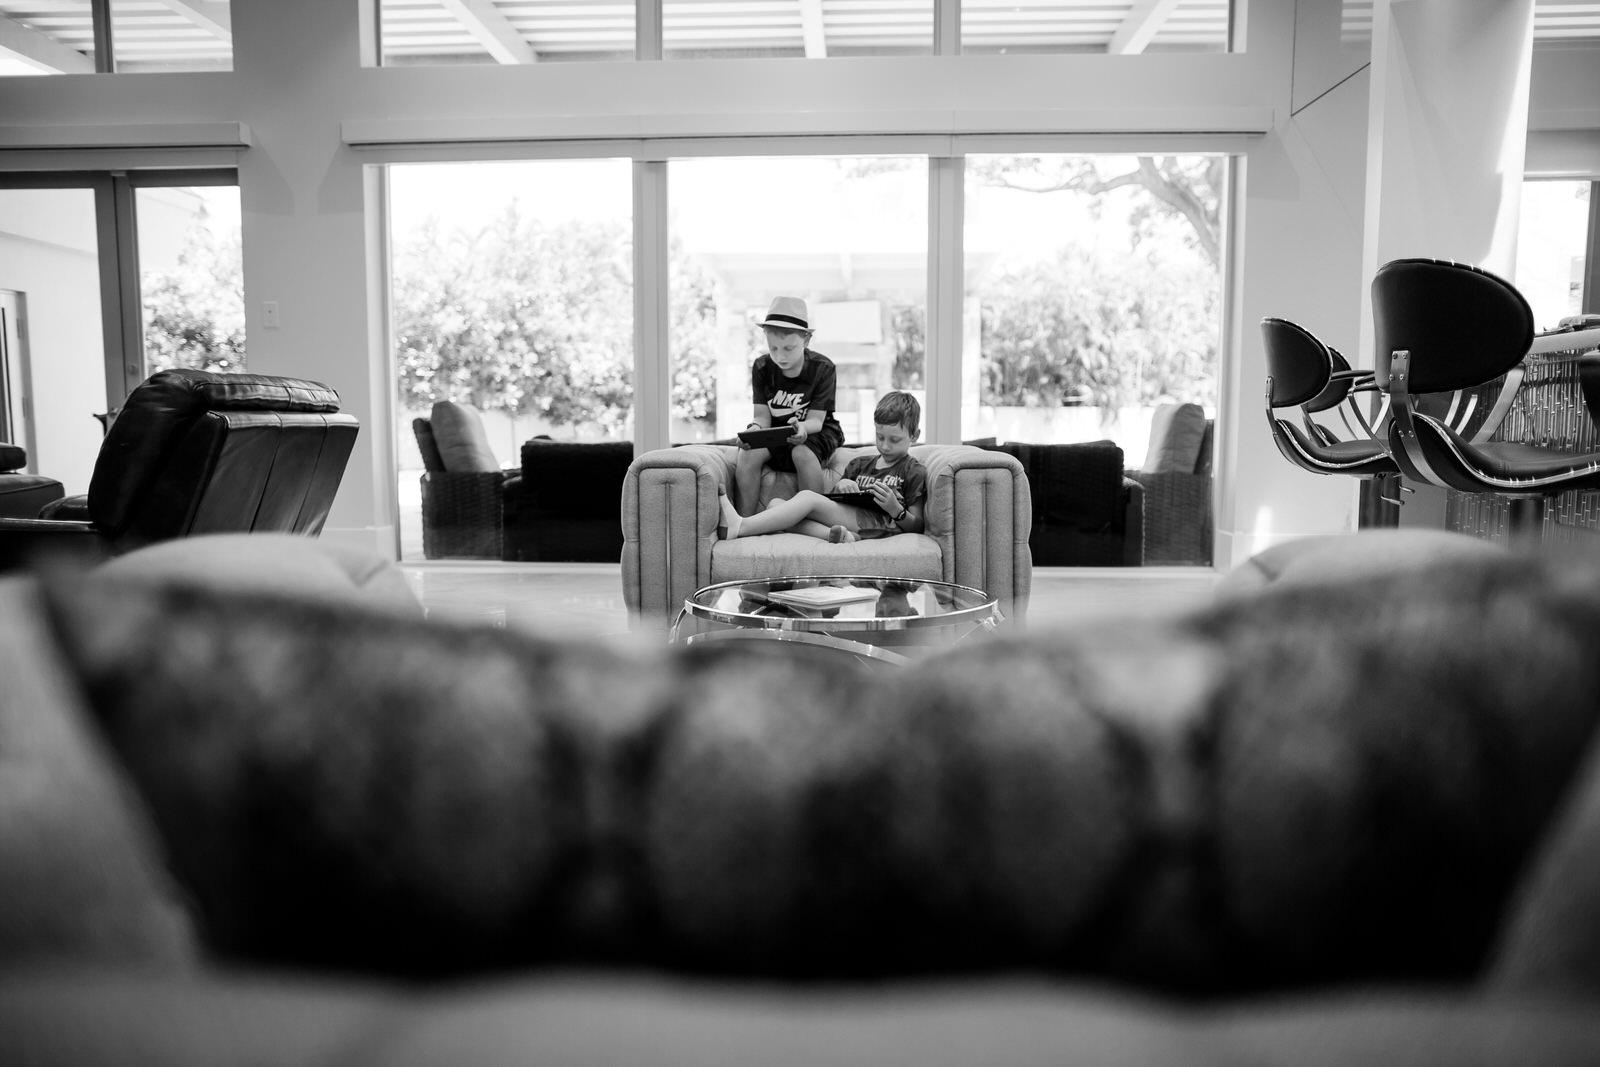 kids_playing_2018_denver_family_experience.jpg